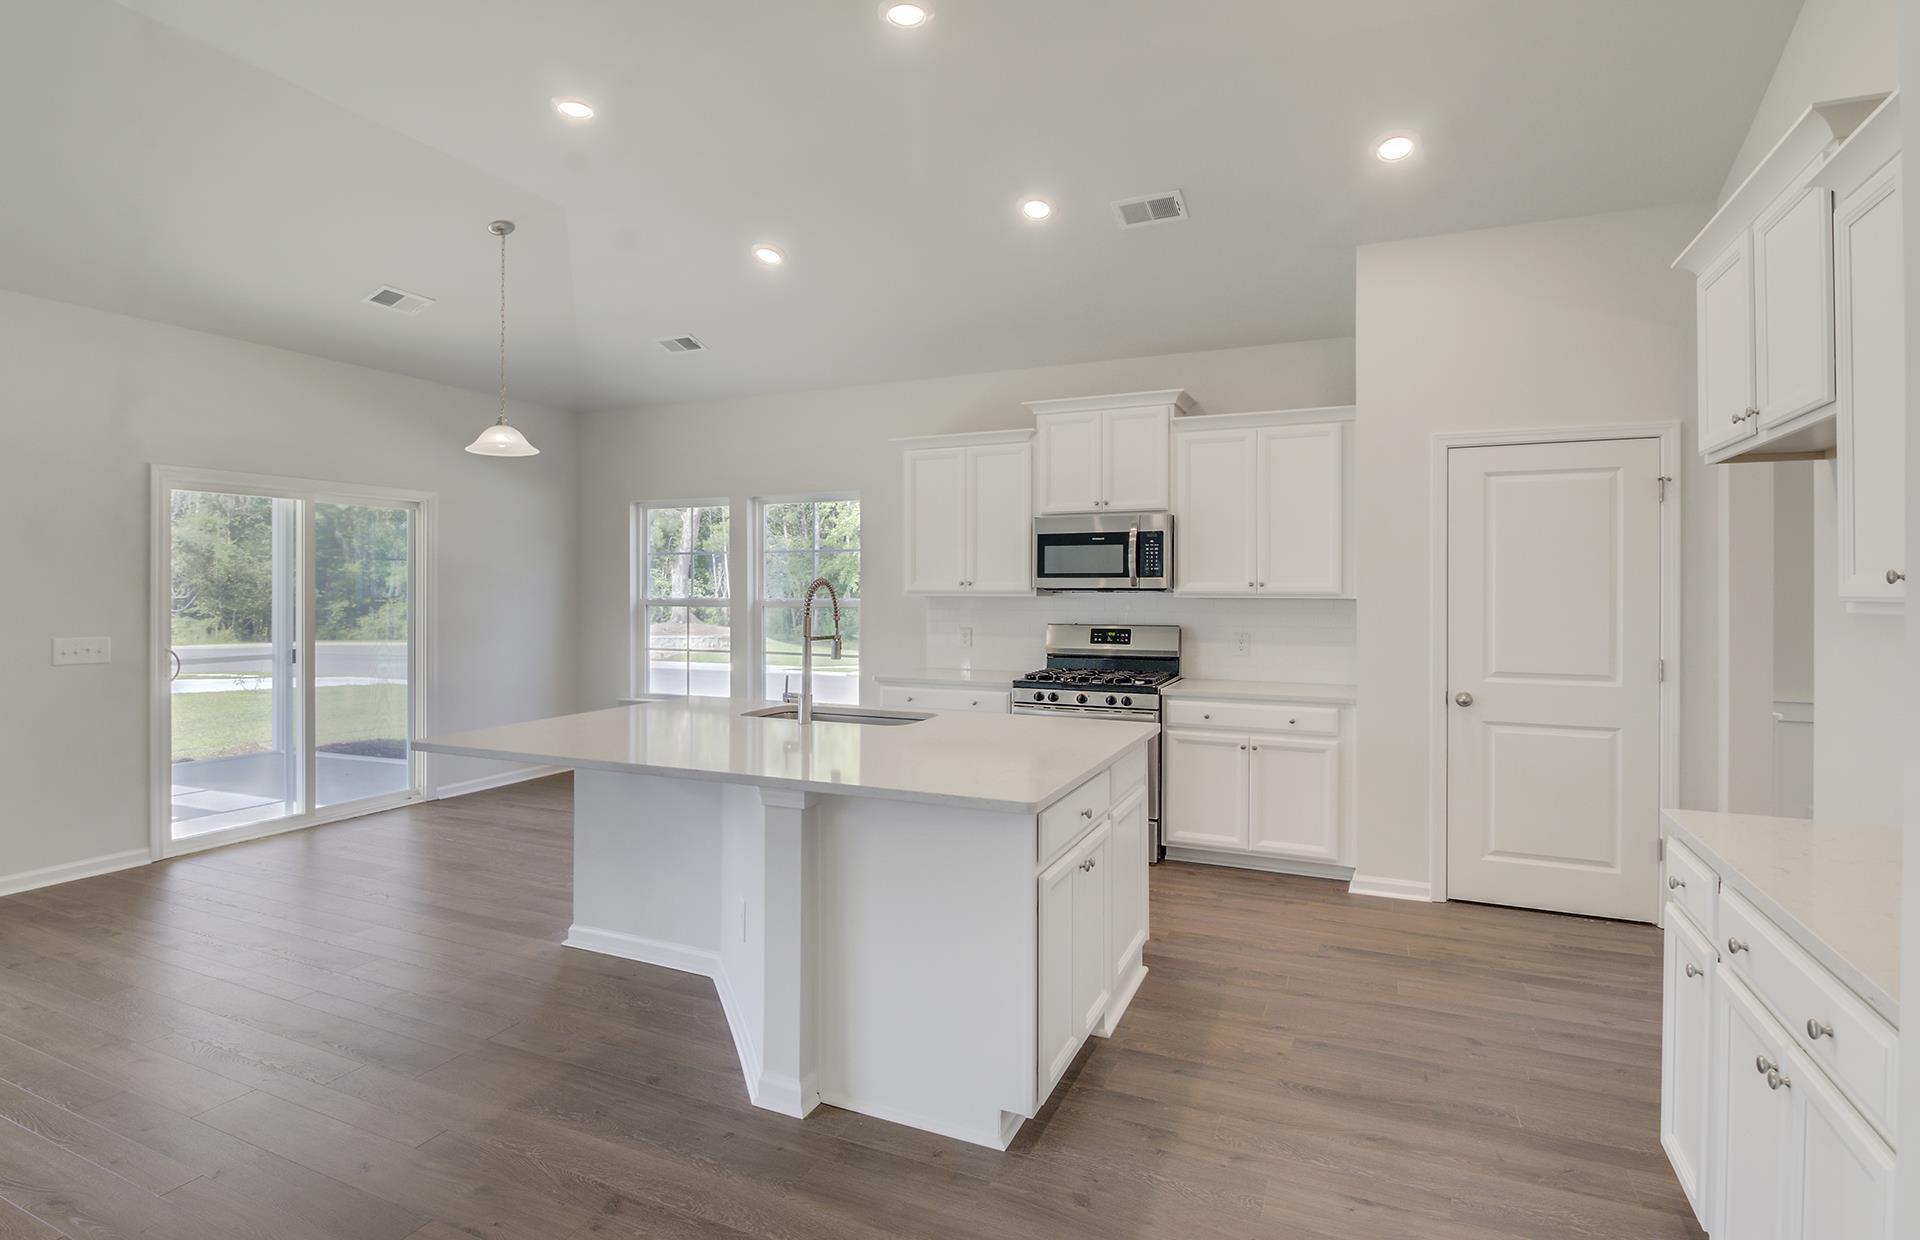 Cane Bay Plantation Homes For Sale - 205 Granton Edge, Summerville, SC - 12